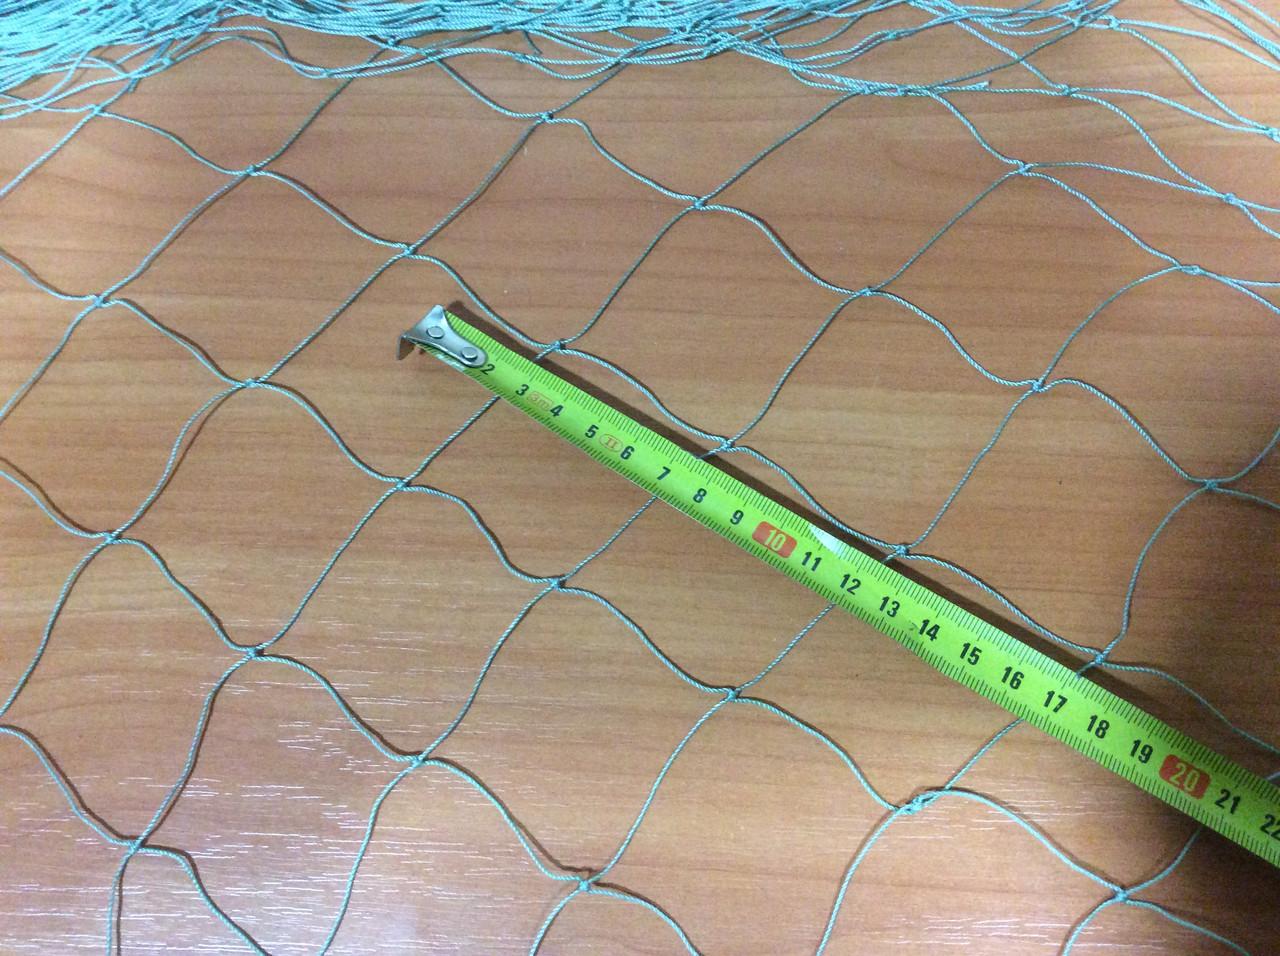 Сетка капроновая ячейка 50мм нитка 0,8мм ширина 20м